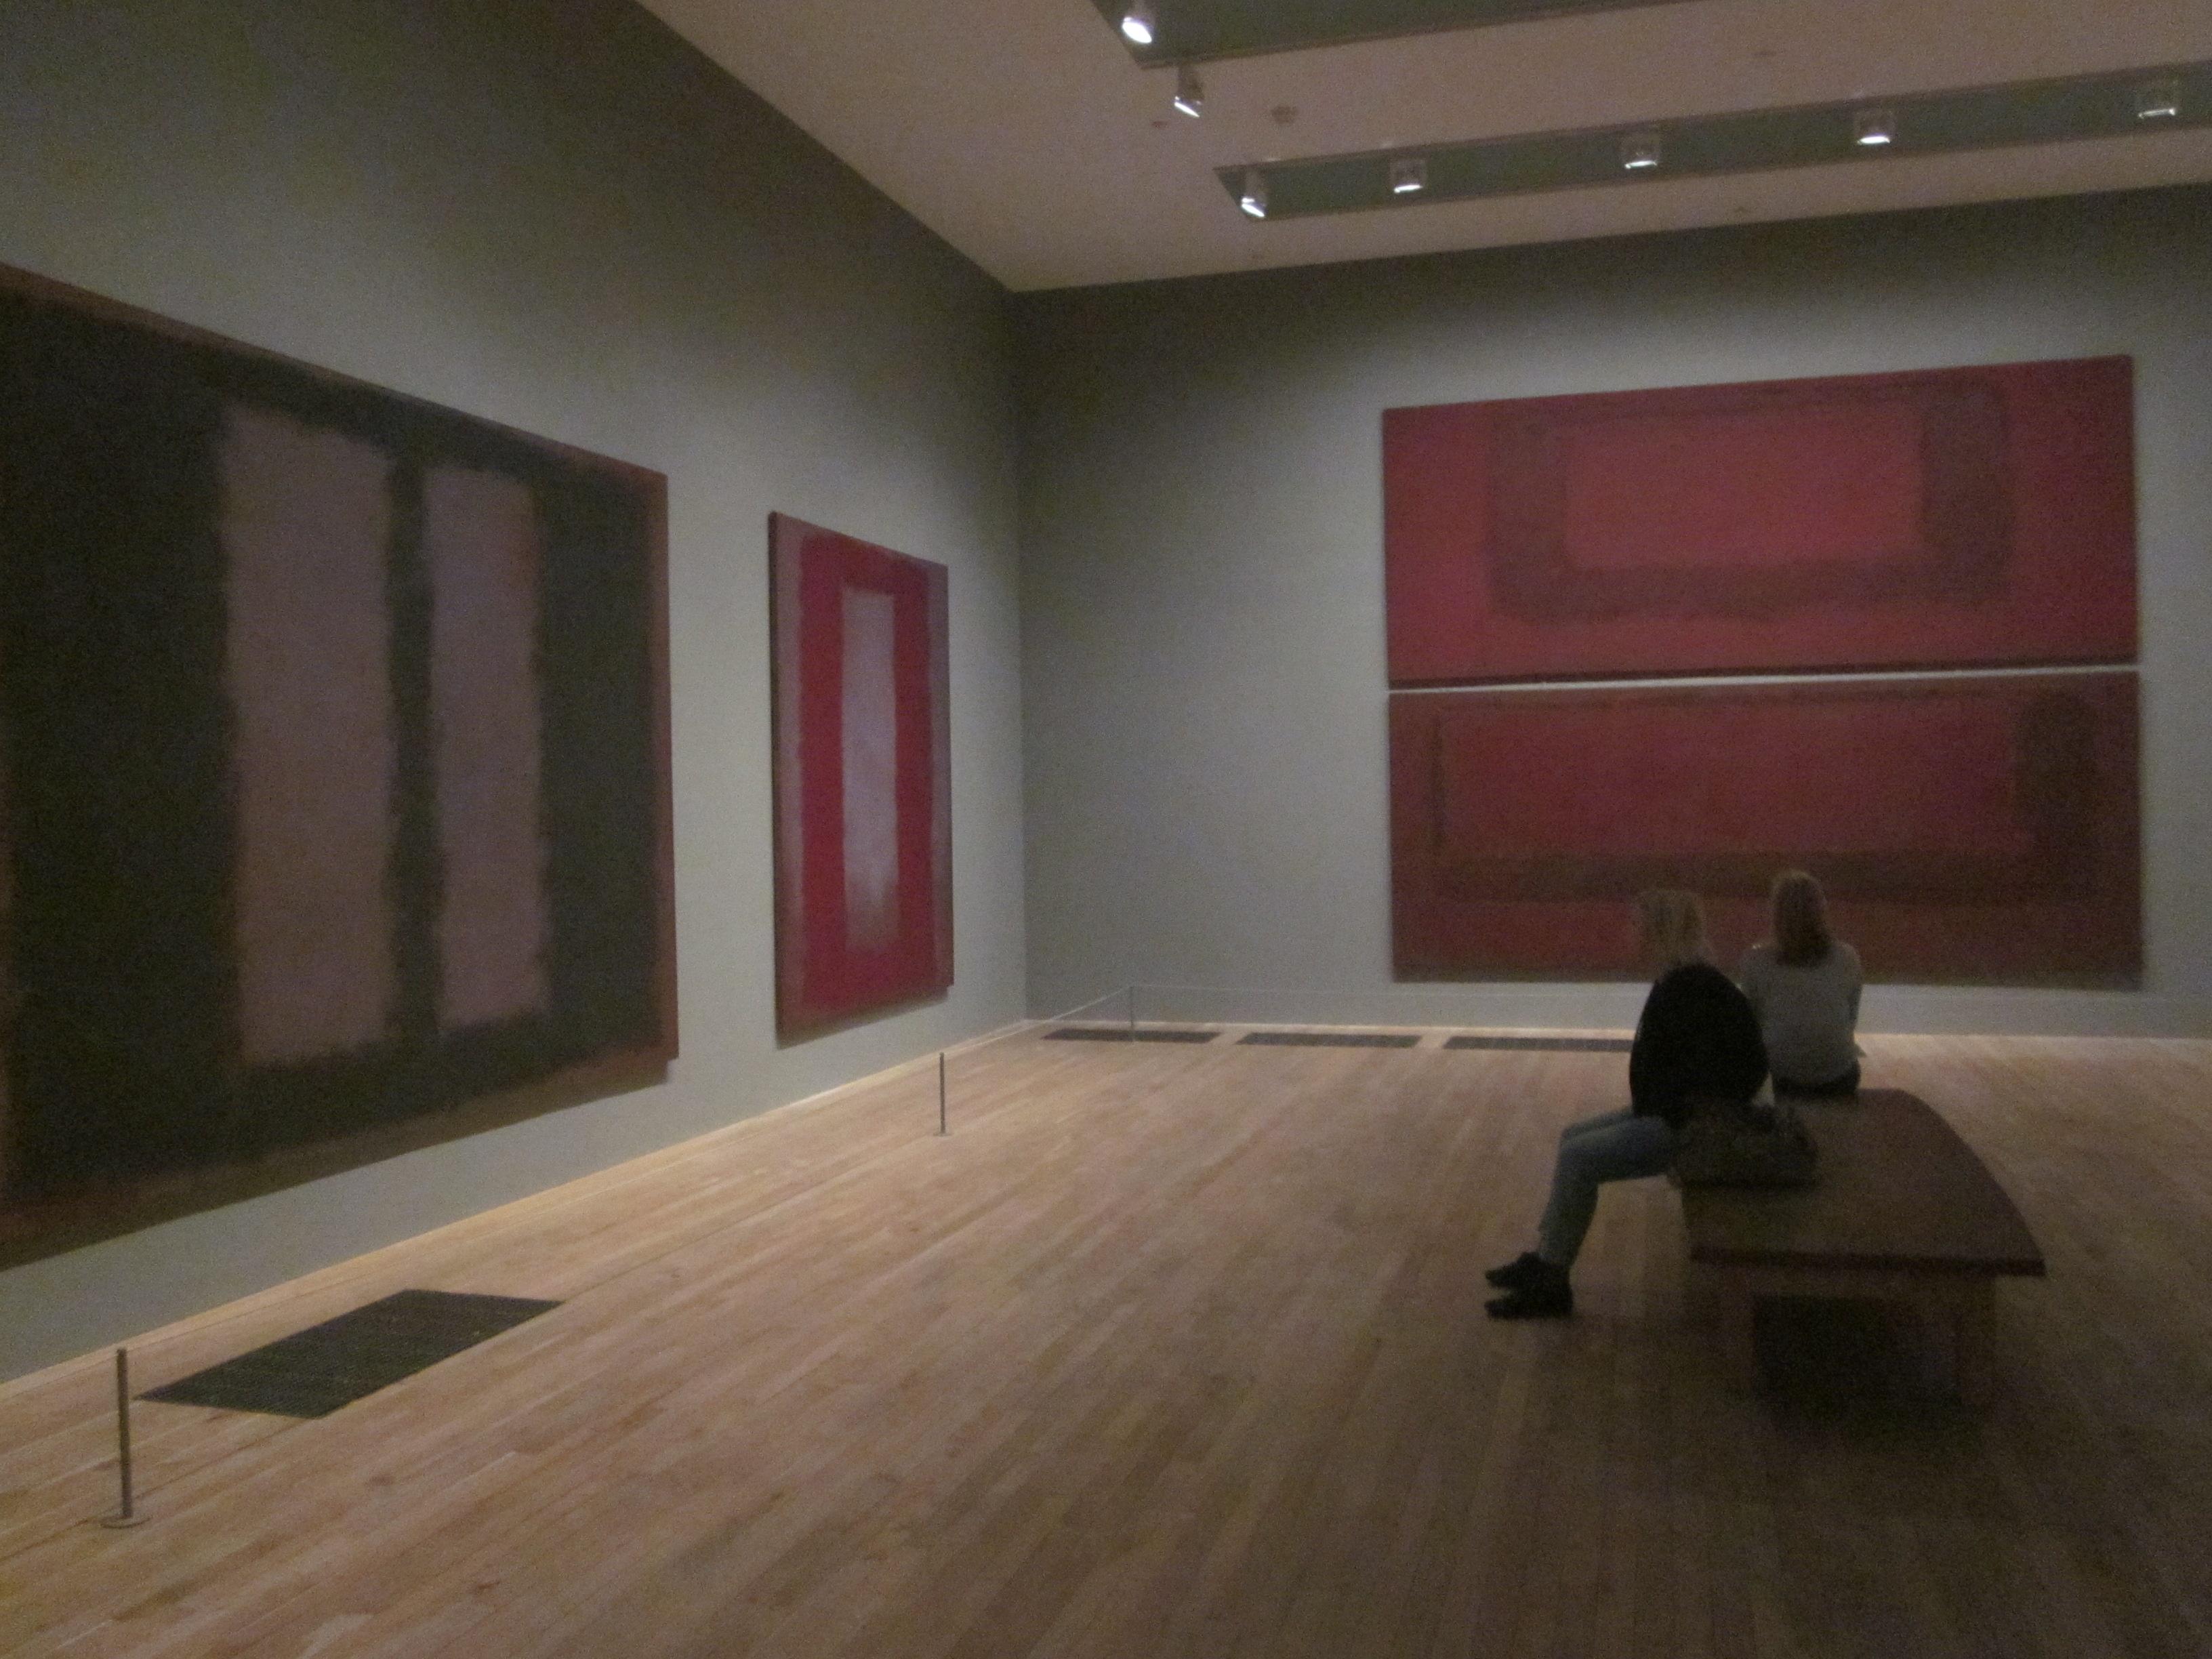 Ausstellungsraum tate modern